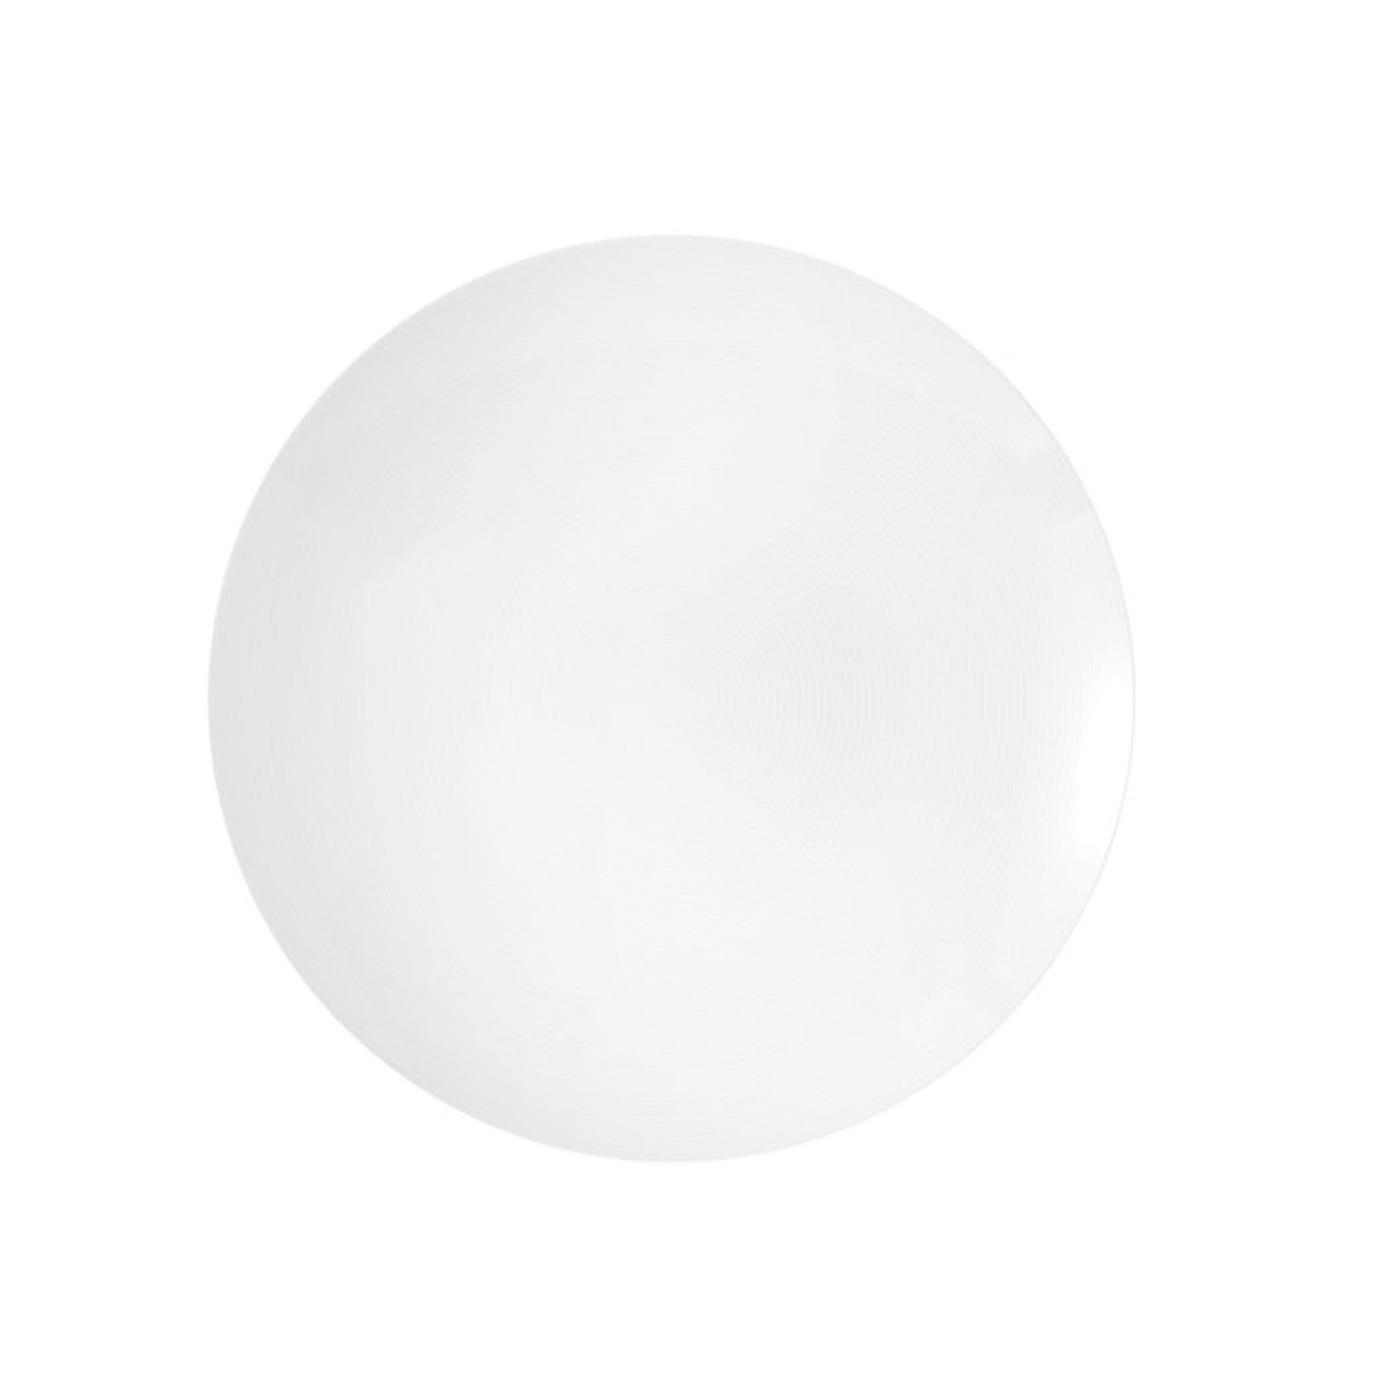 Thomas Loft White Side Plate